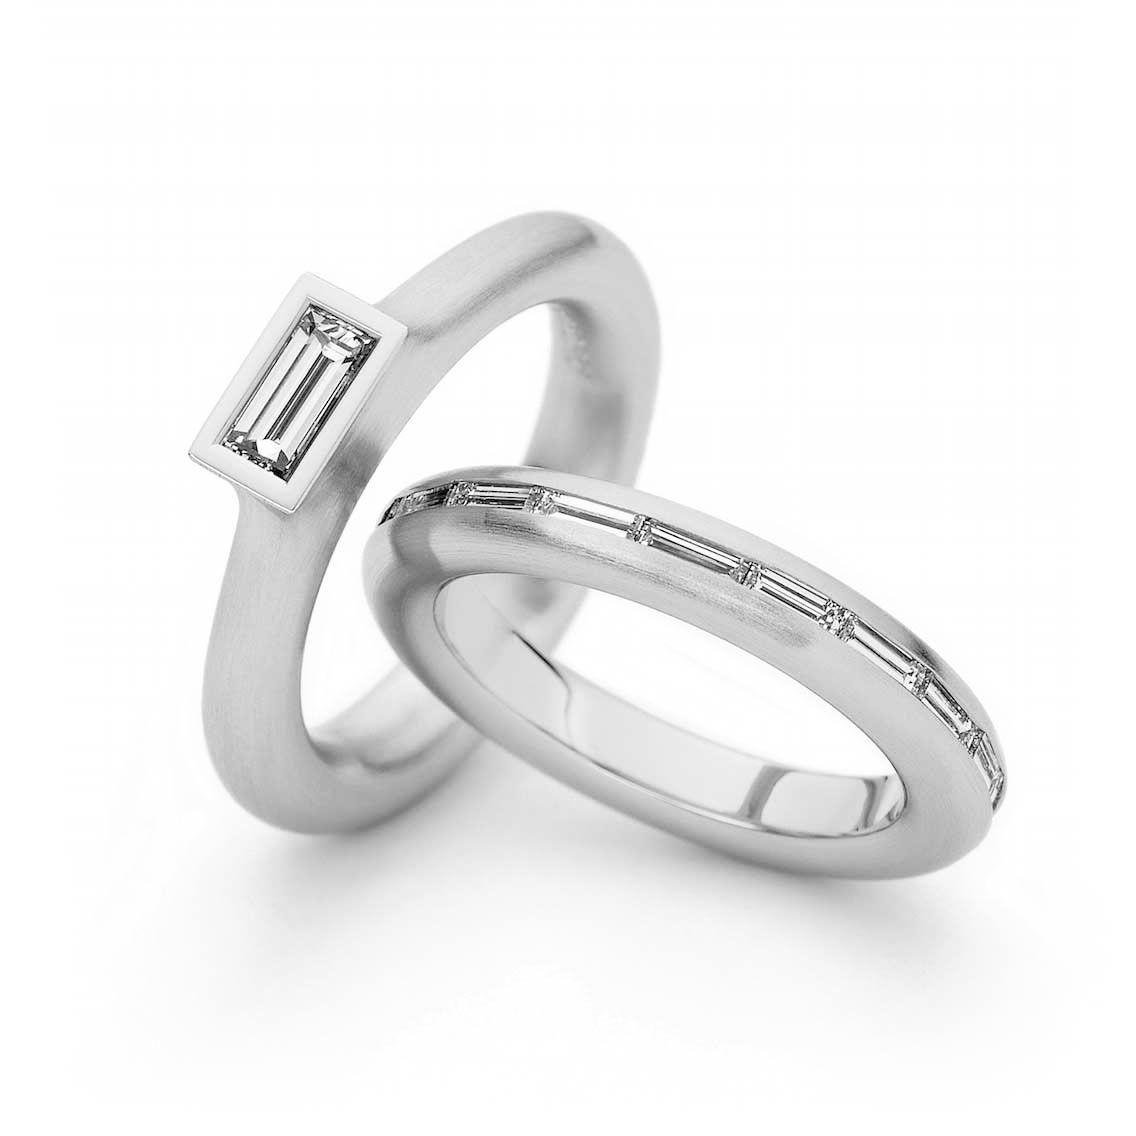 6209b0cf9 Henrich & Denzel - Toska Baguette Engagement Ring | Watches ...